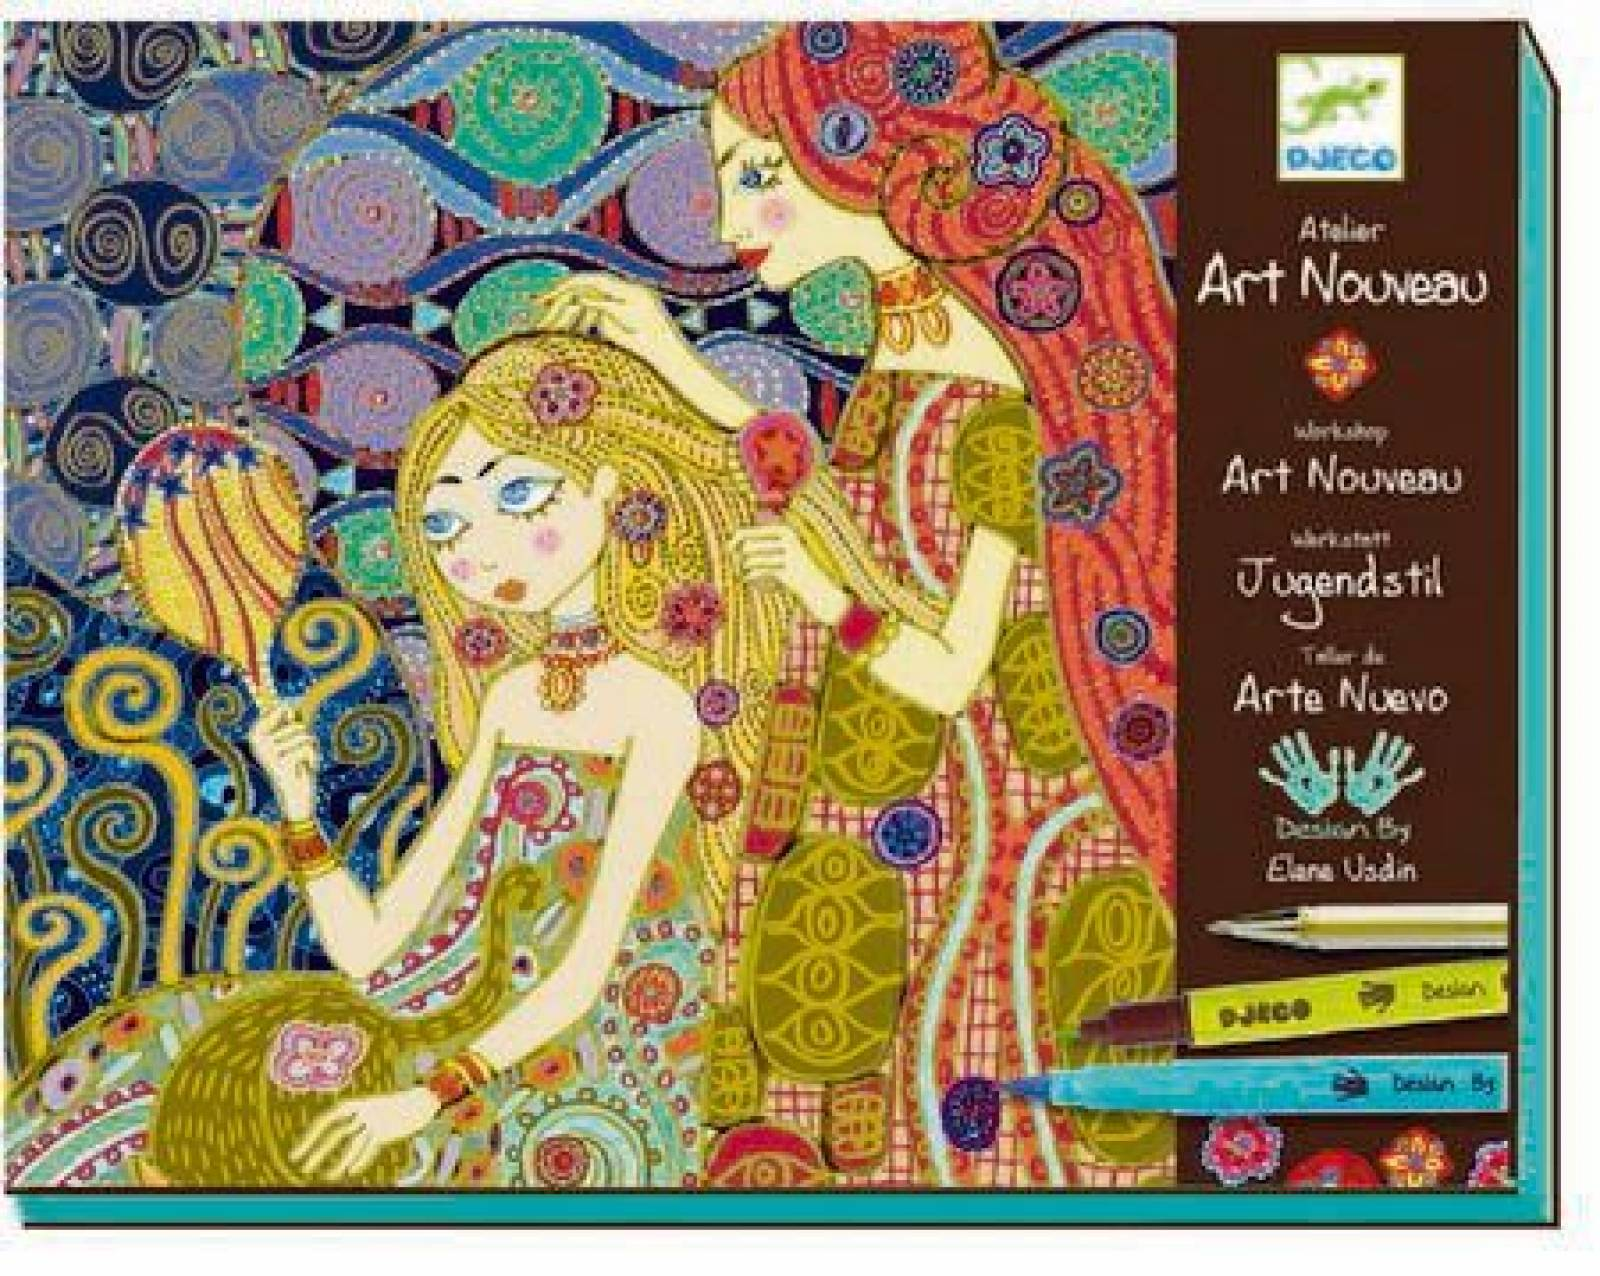 Art Nouveau Art Set By Djeco 9-13yrs